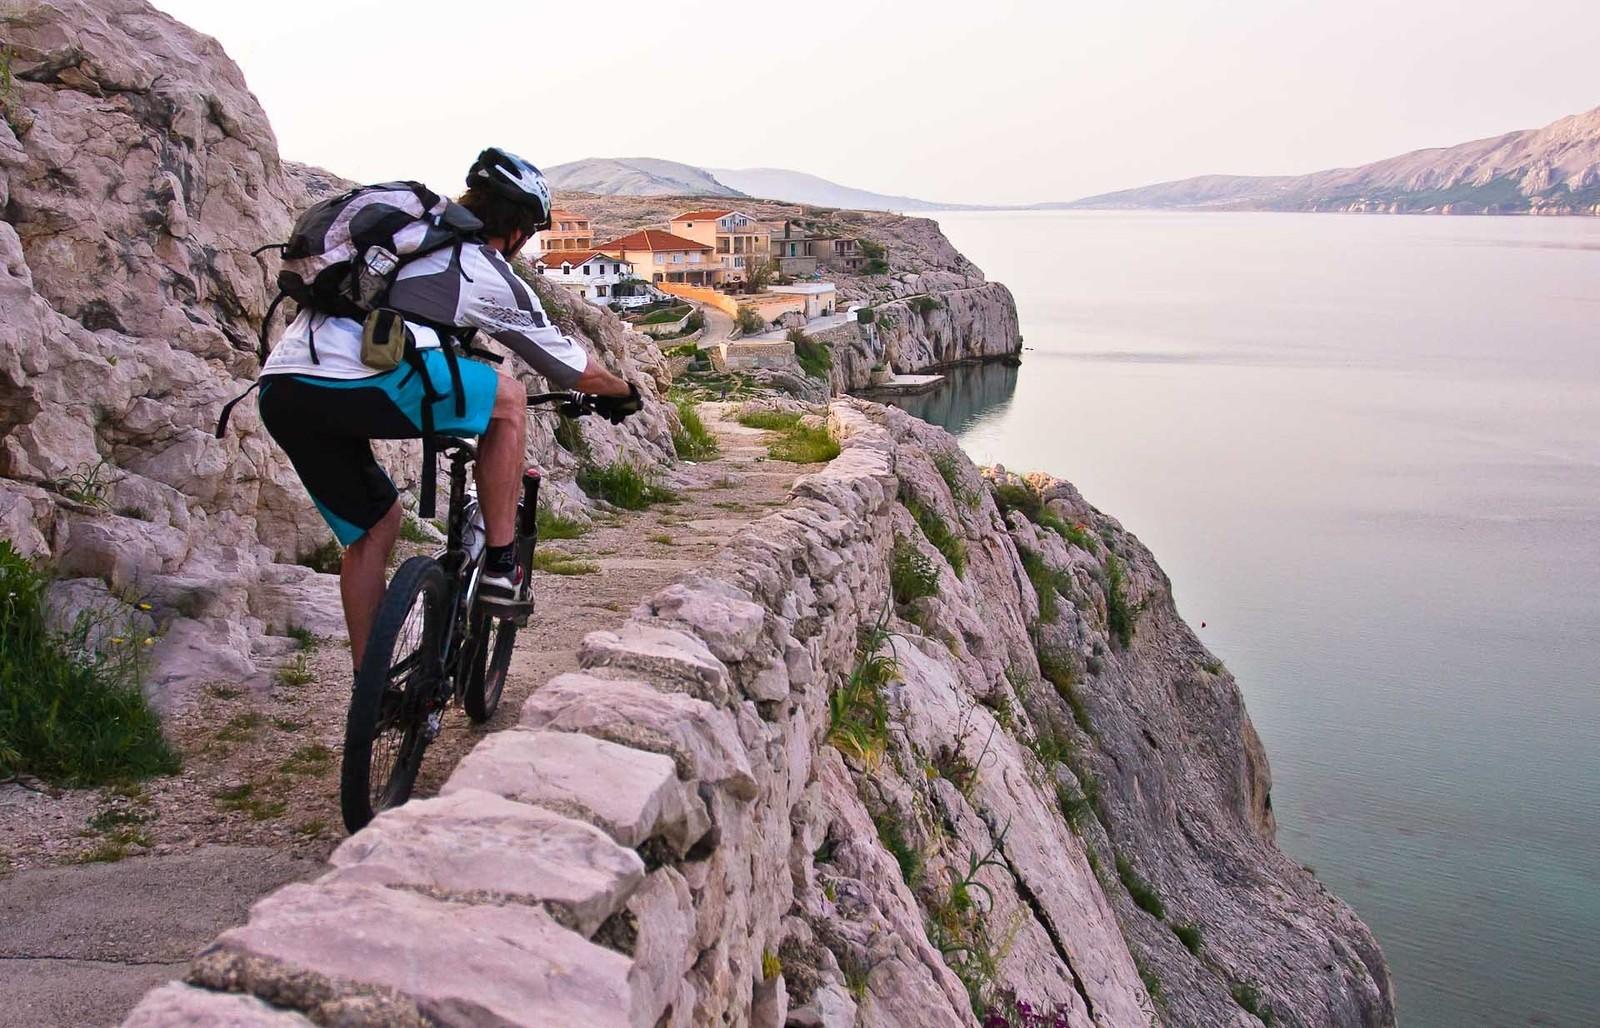 Croatian coast - berto - Mountain Biking Pictures - Vital MTB